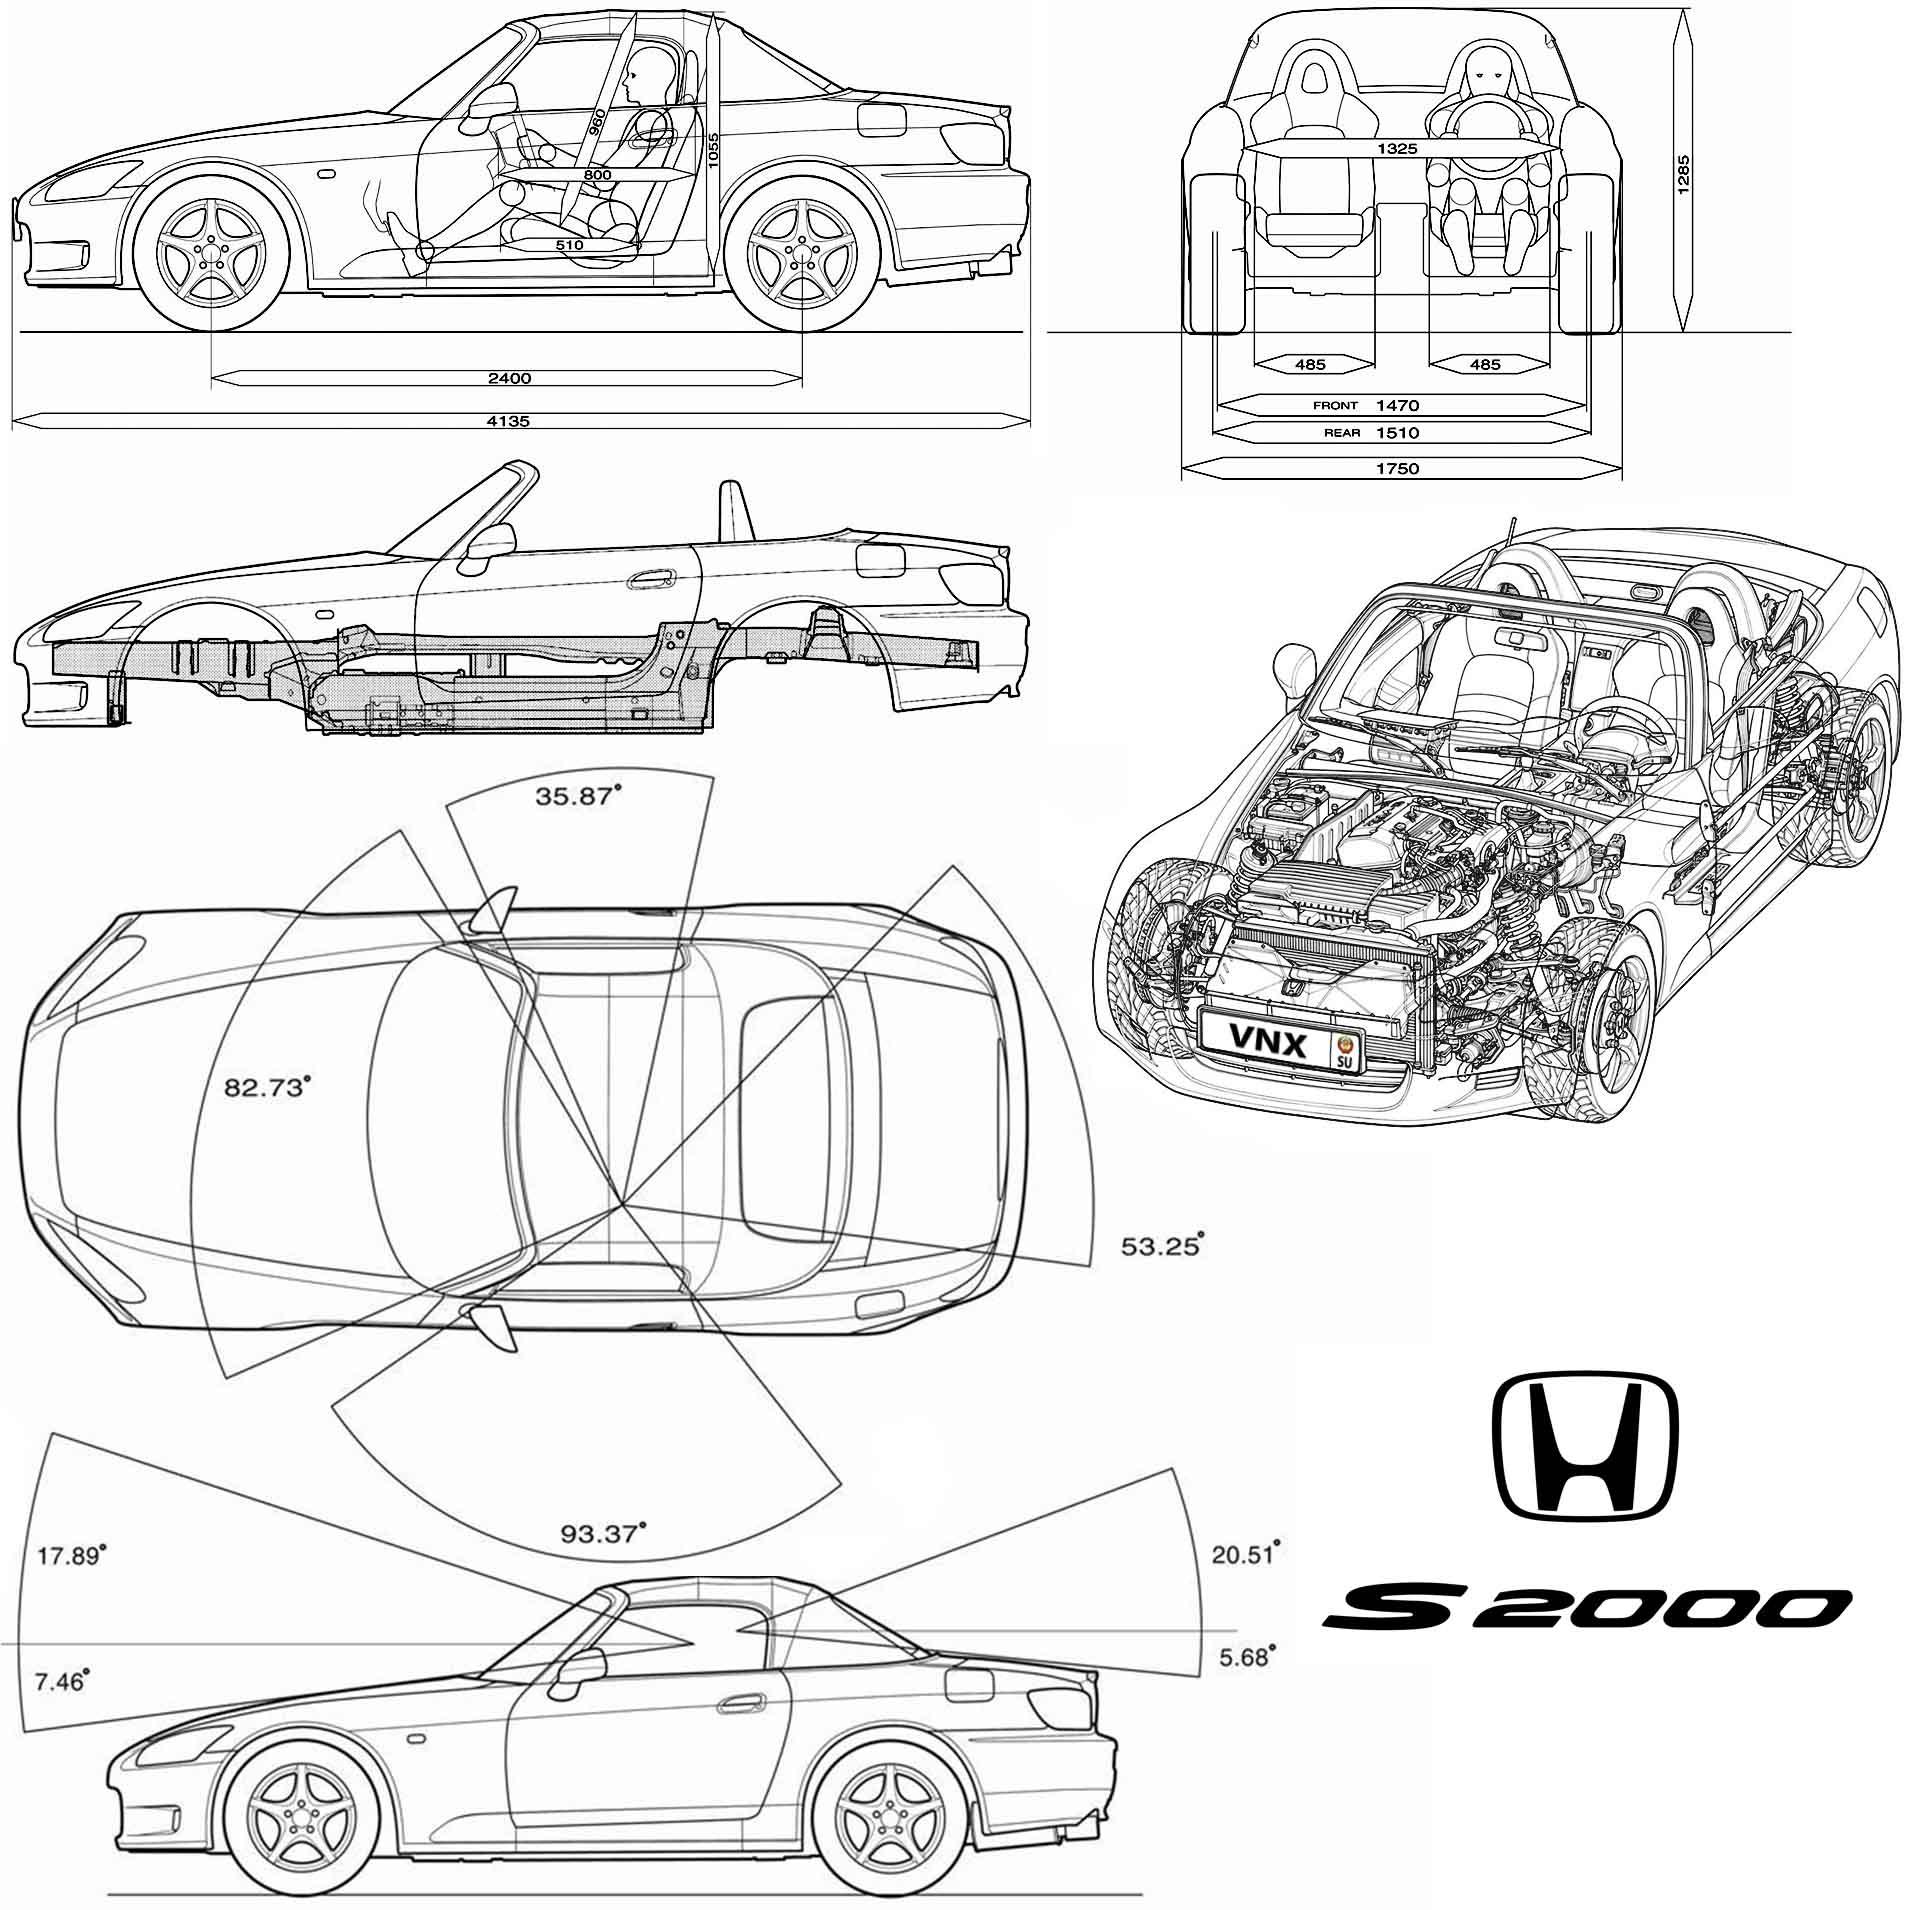 Размеры салона Хонда С2000 1999-2003 (interior dimensions Honda S2000) ...